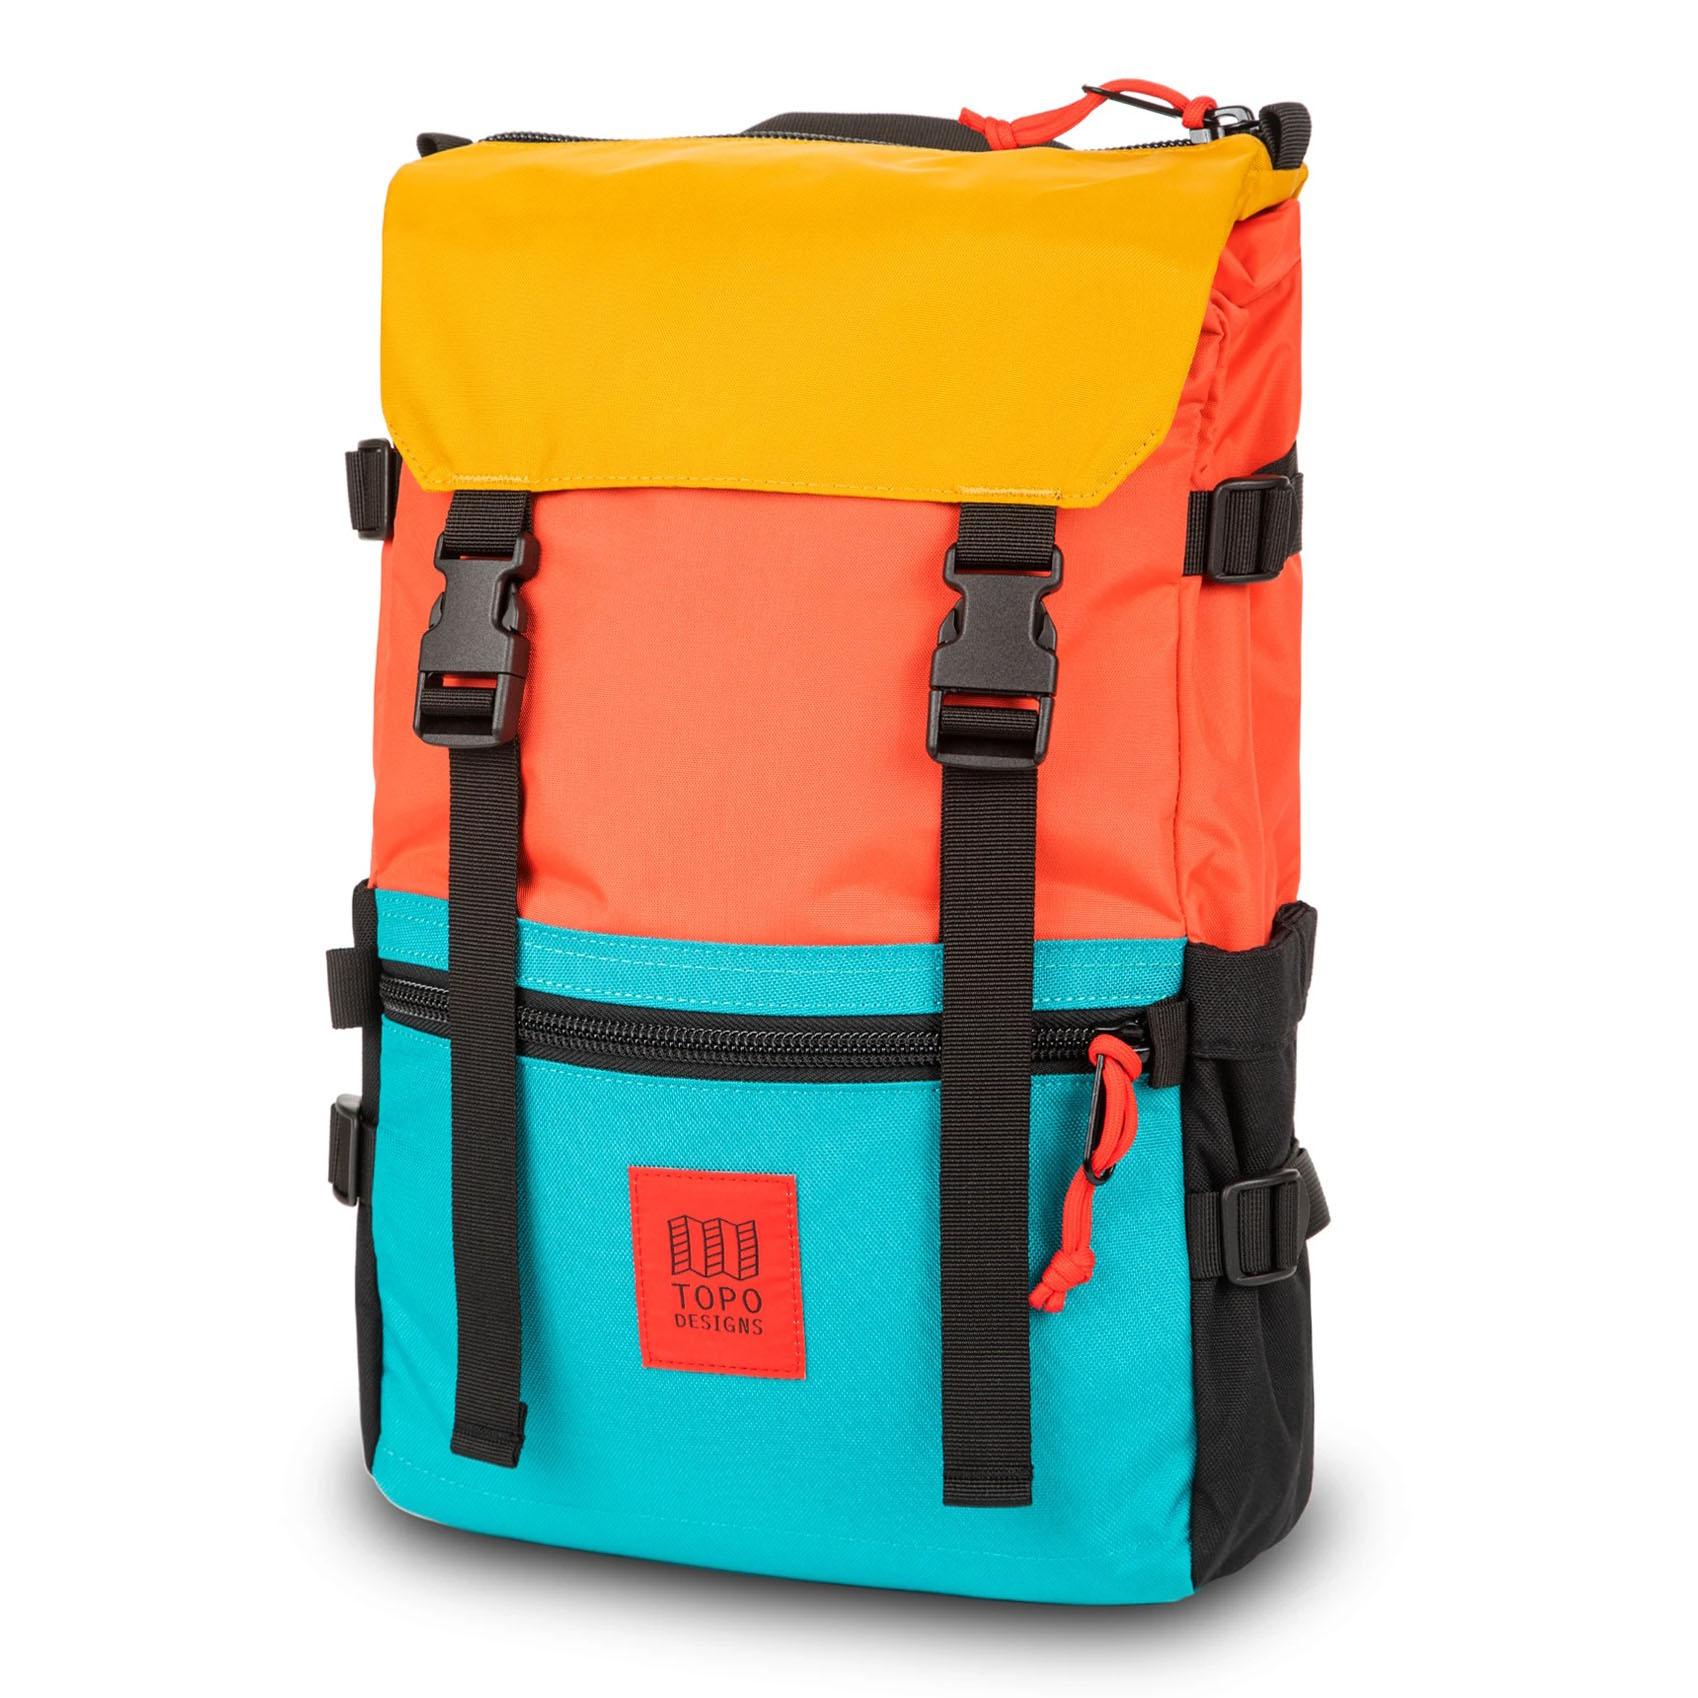 Topo Designs Rover Backpack, best men's backpacks